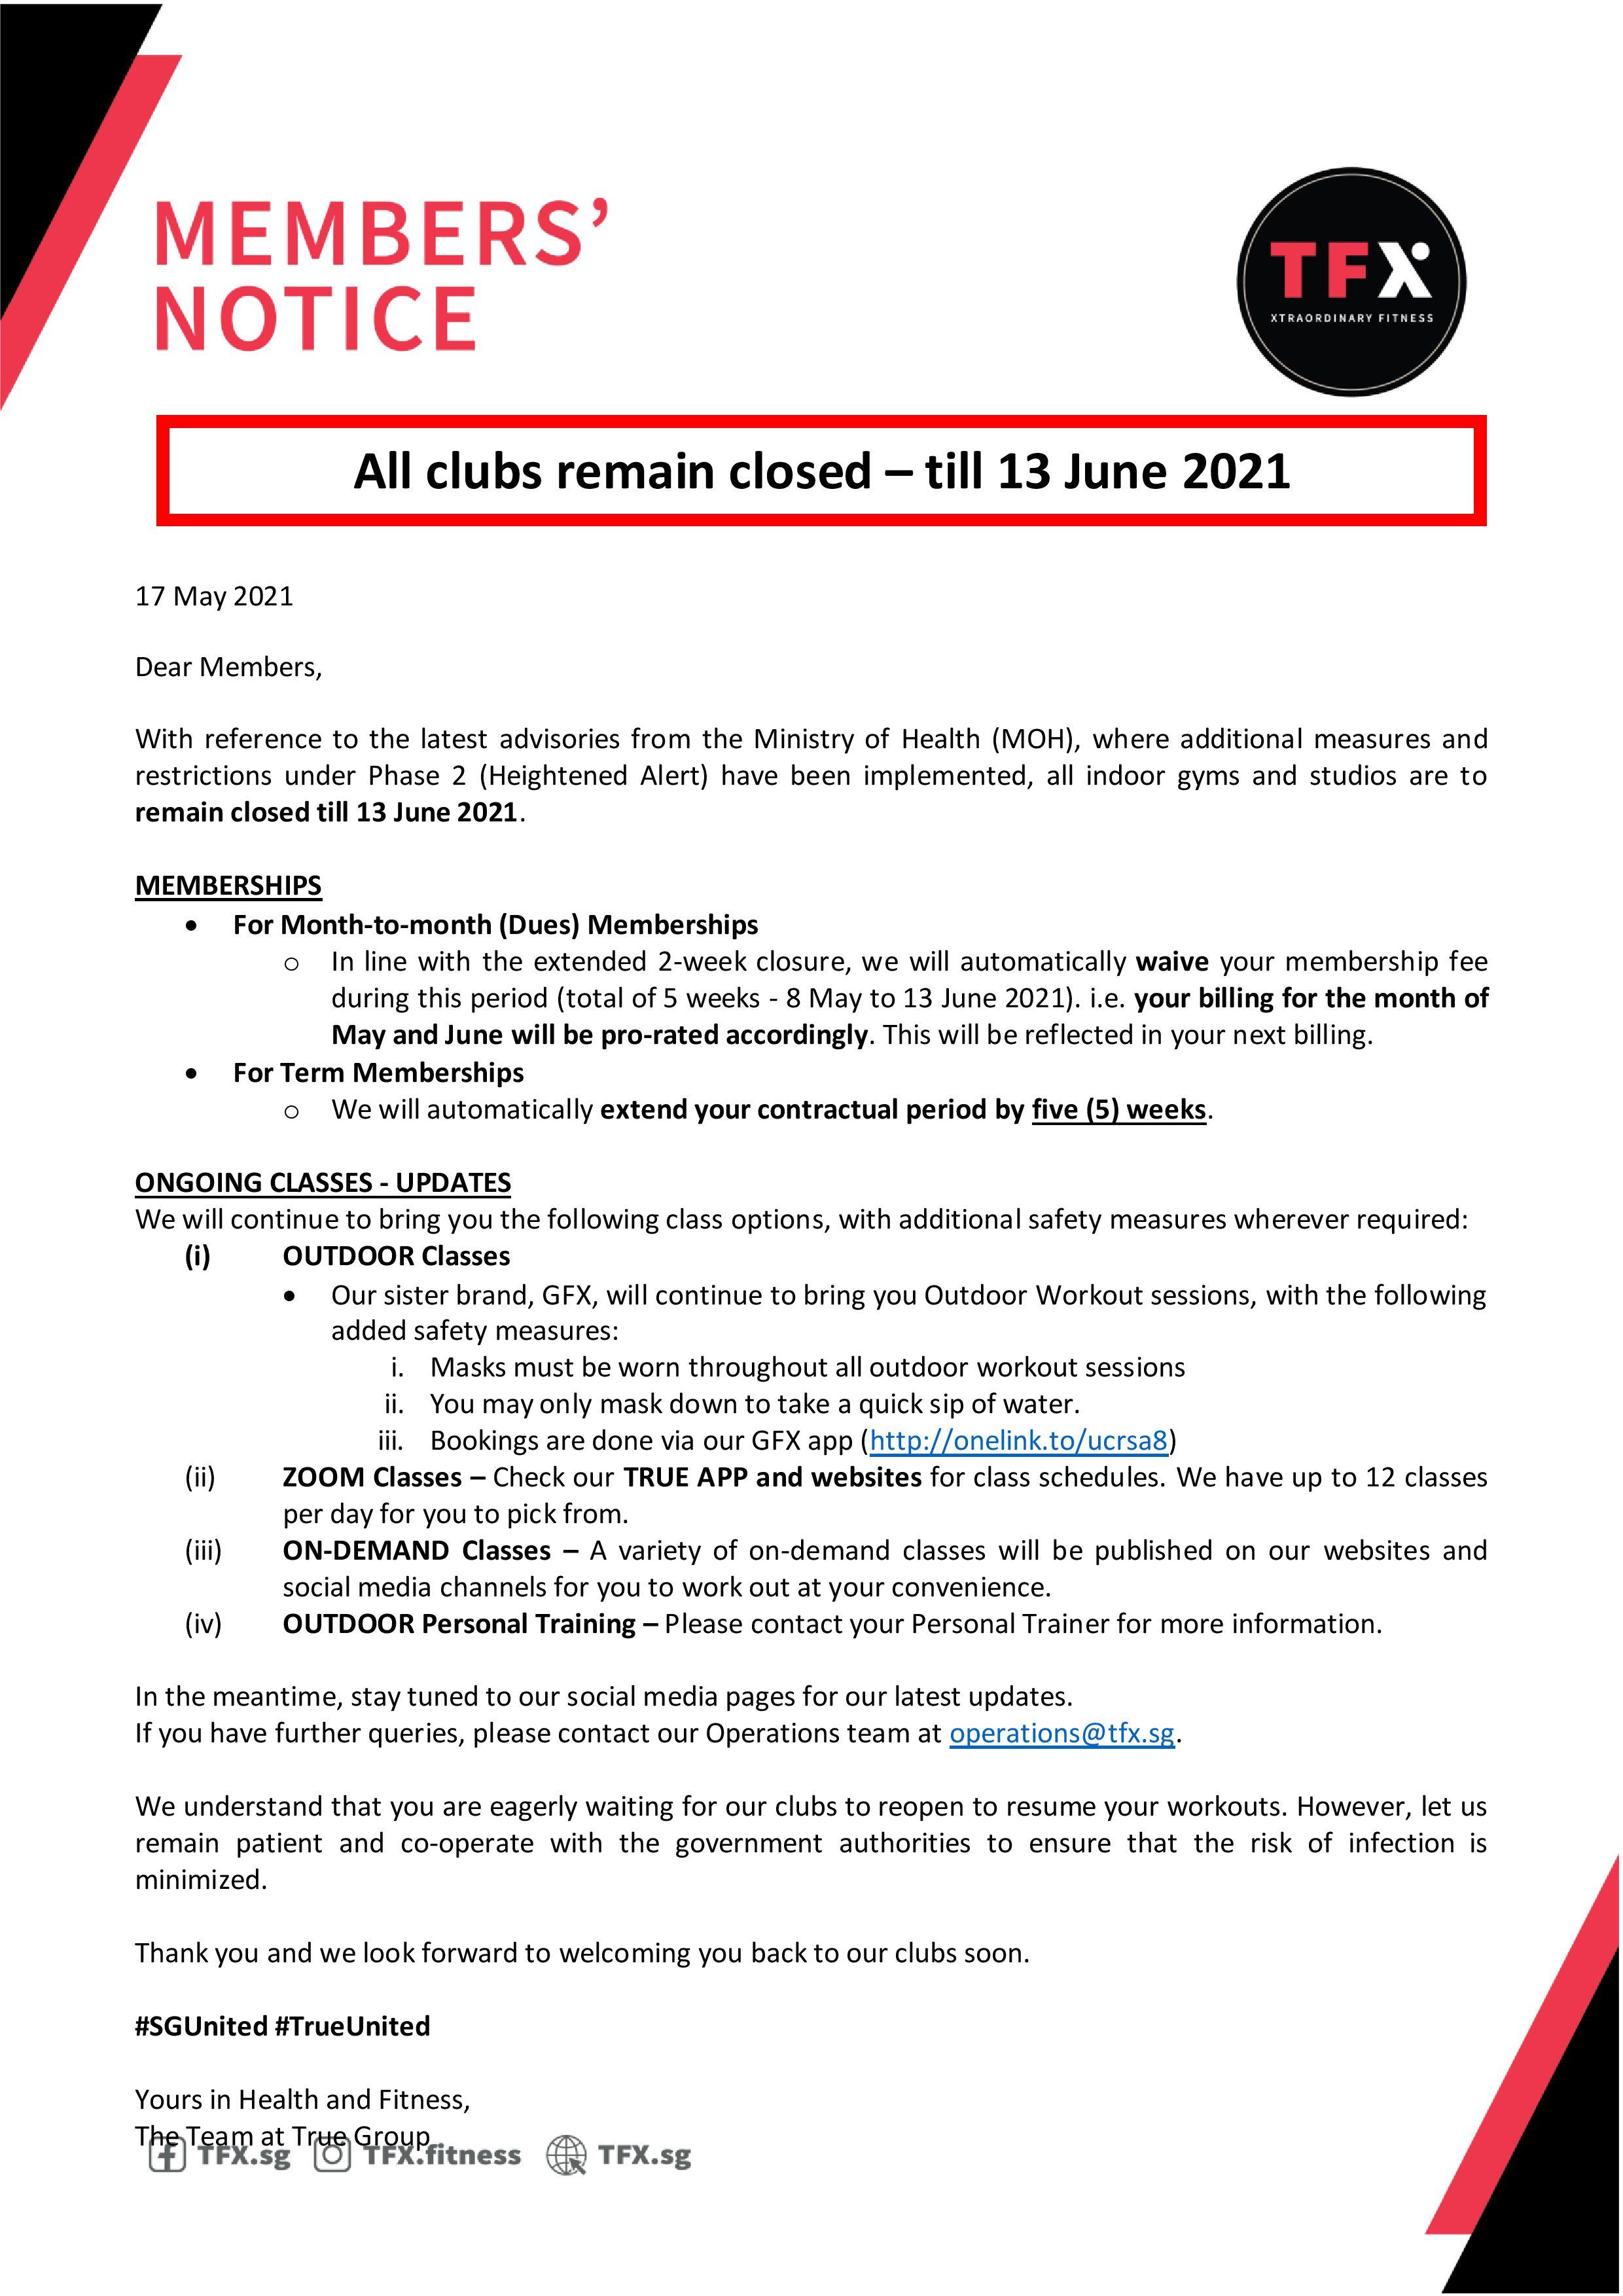 Clubs temporary closed - Till 13 June 2021